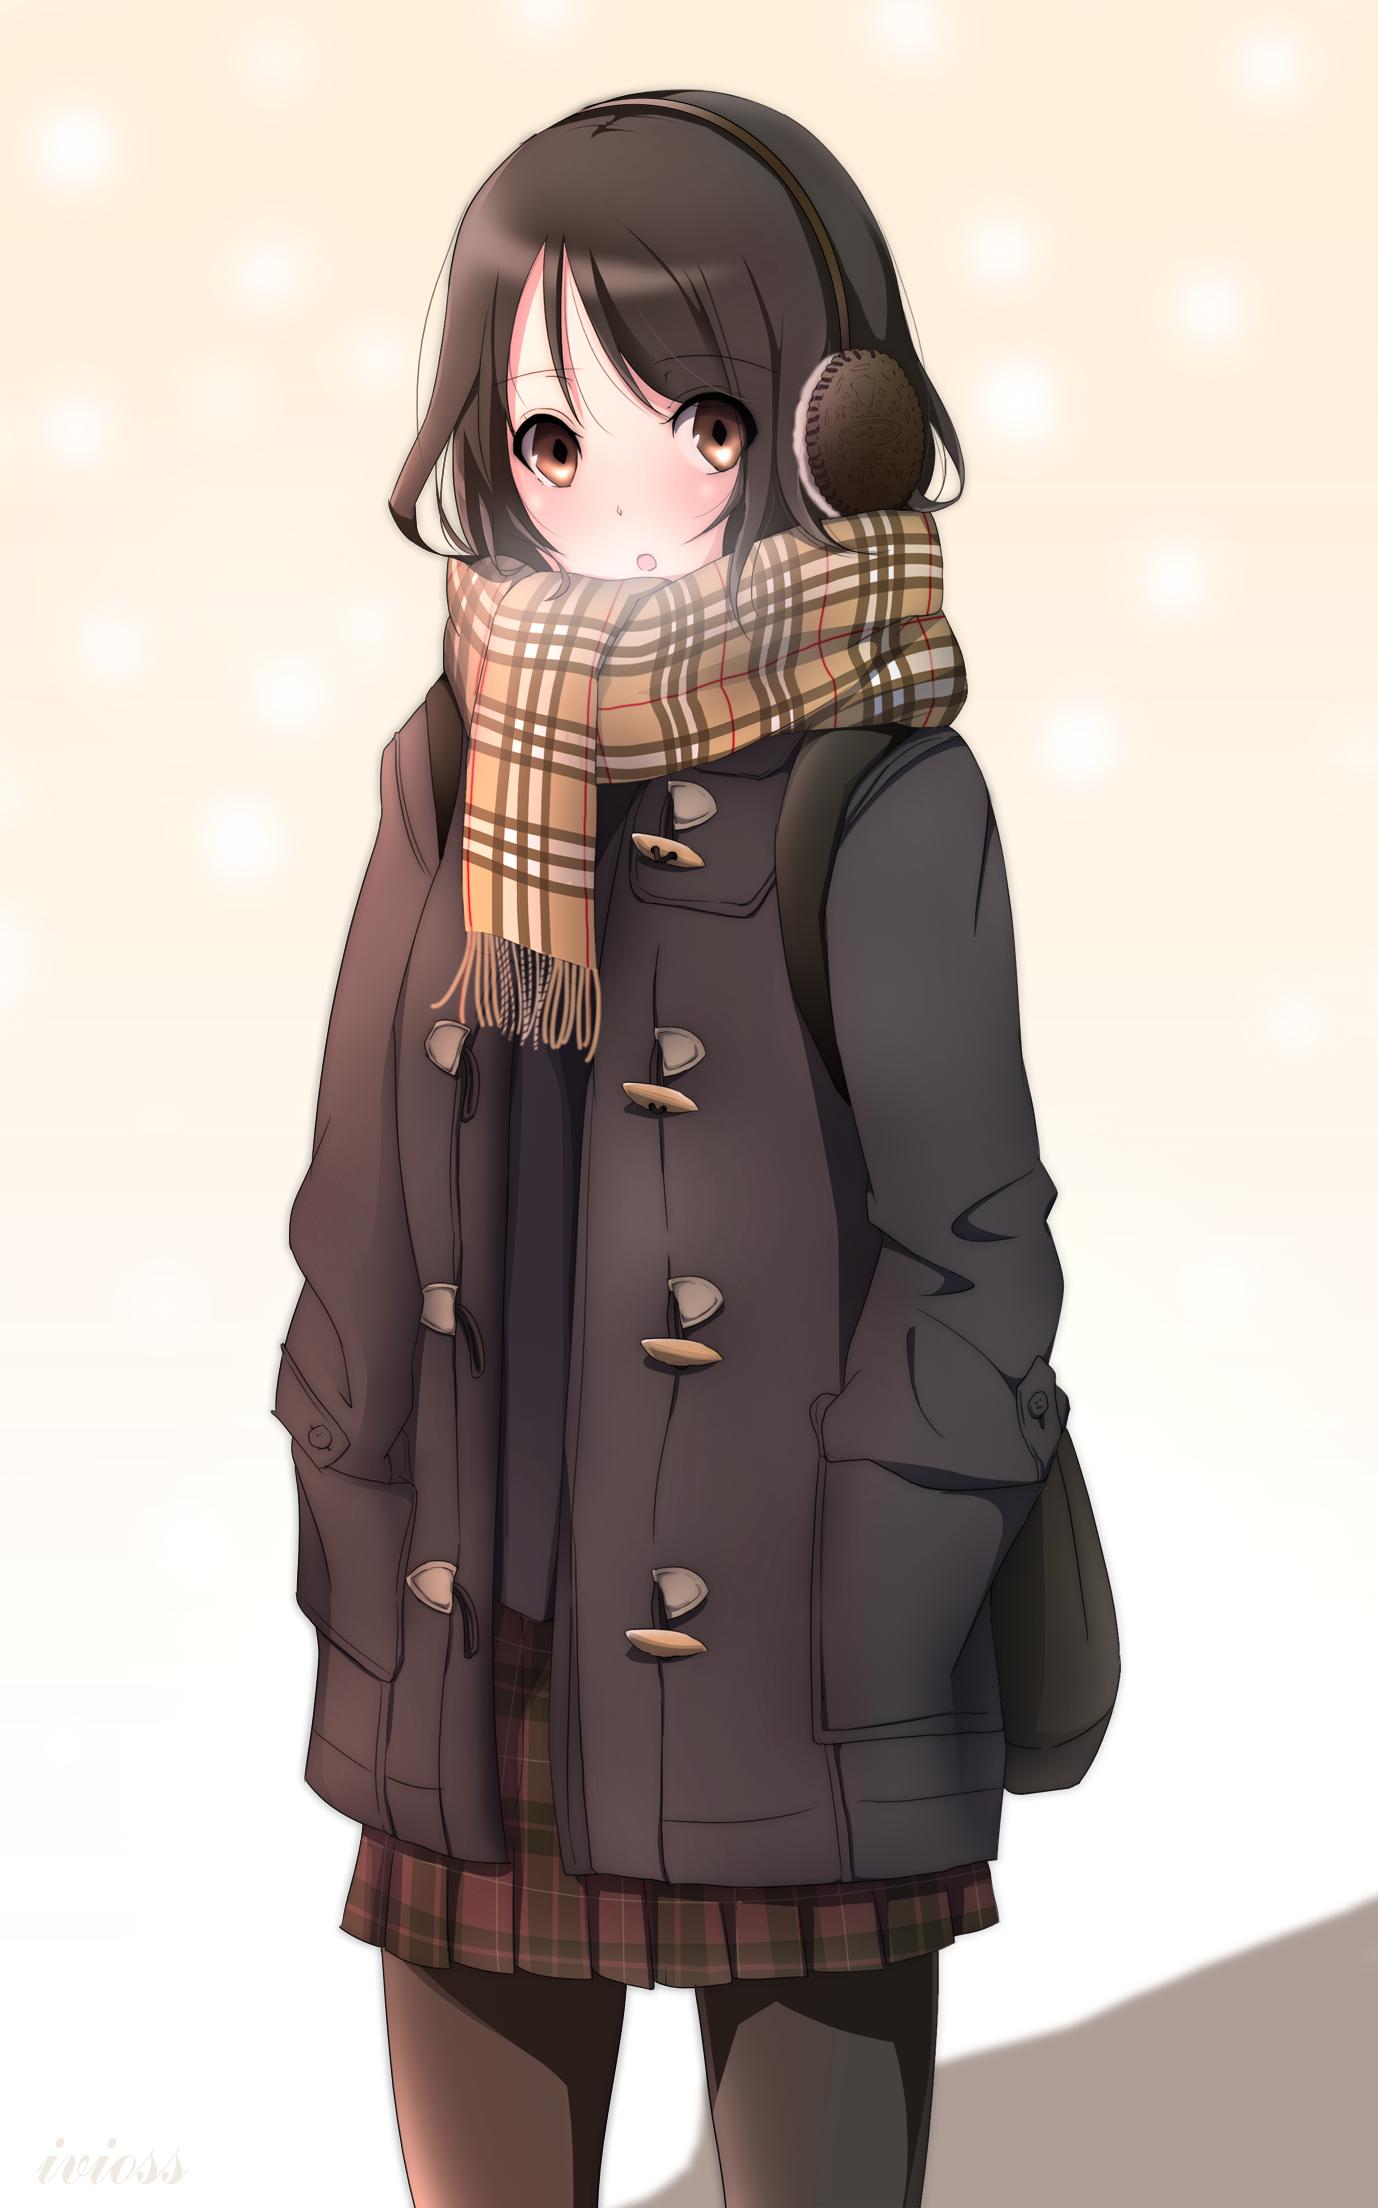 id=32649305,毛呢大衣美女,大约在冬季图片,卡通动漫图片